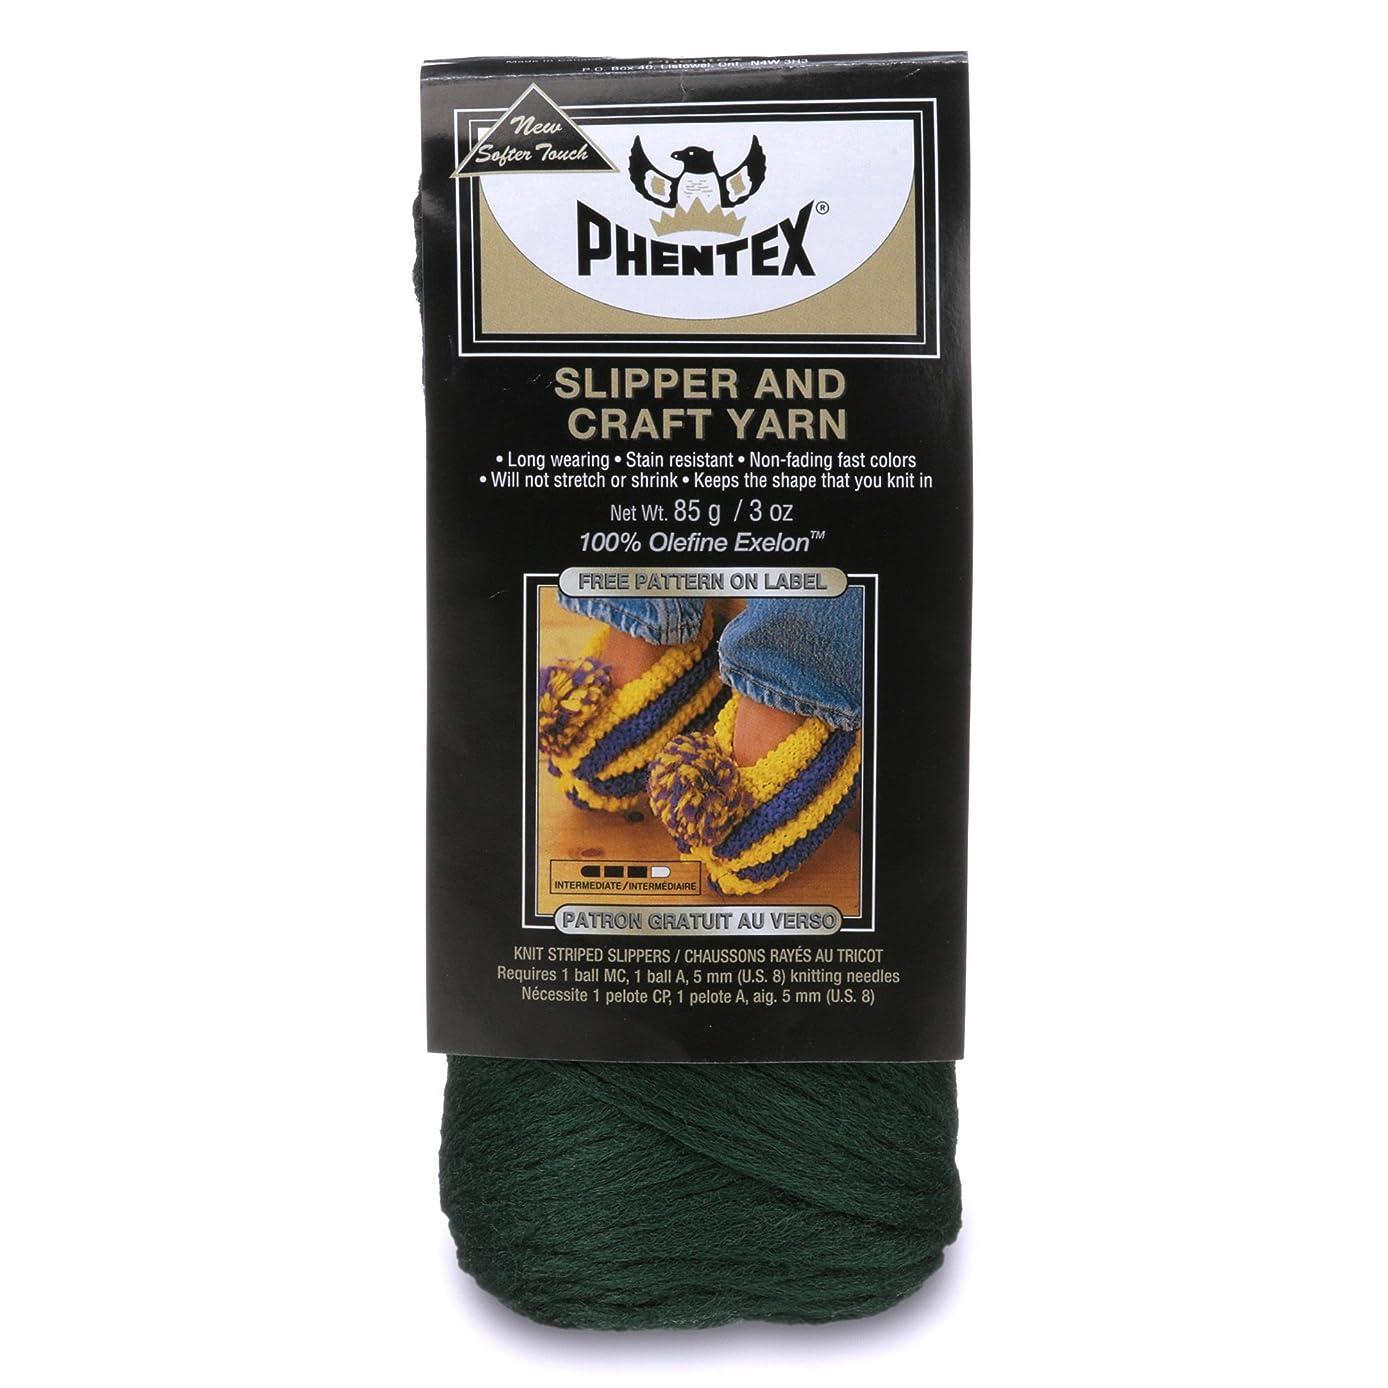 Phentex Slipper & Craft Yarn, 3 Ounce, Deep Green, Single Ball